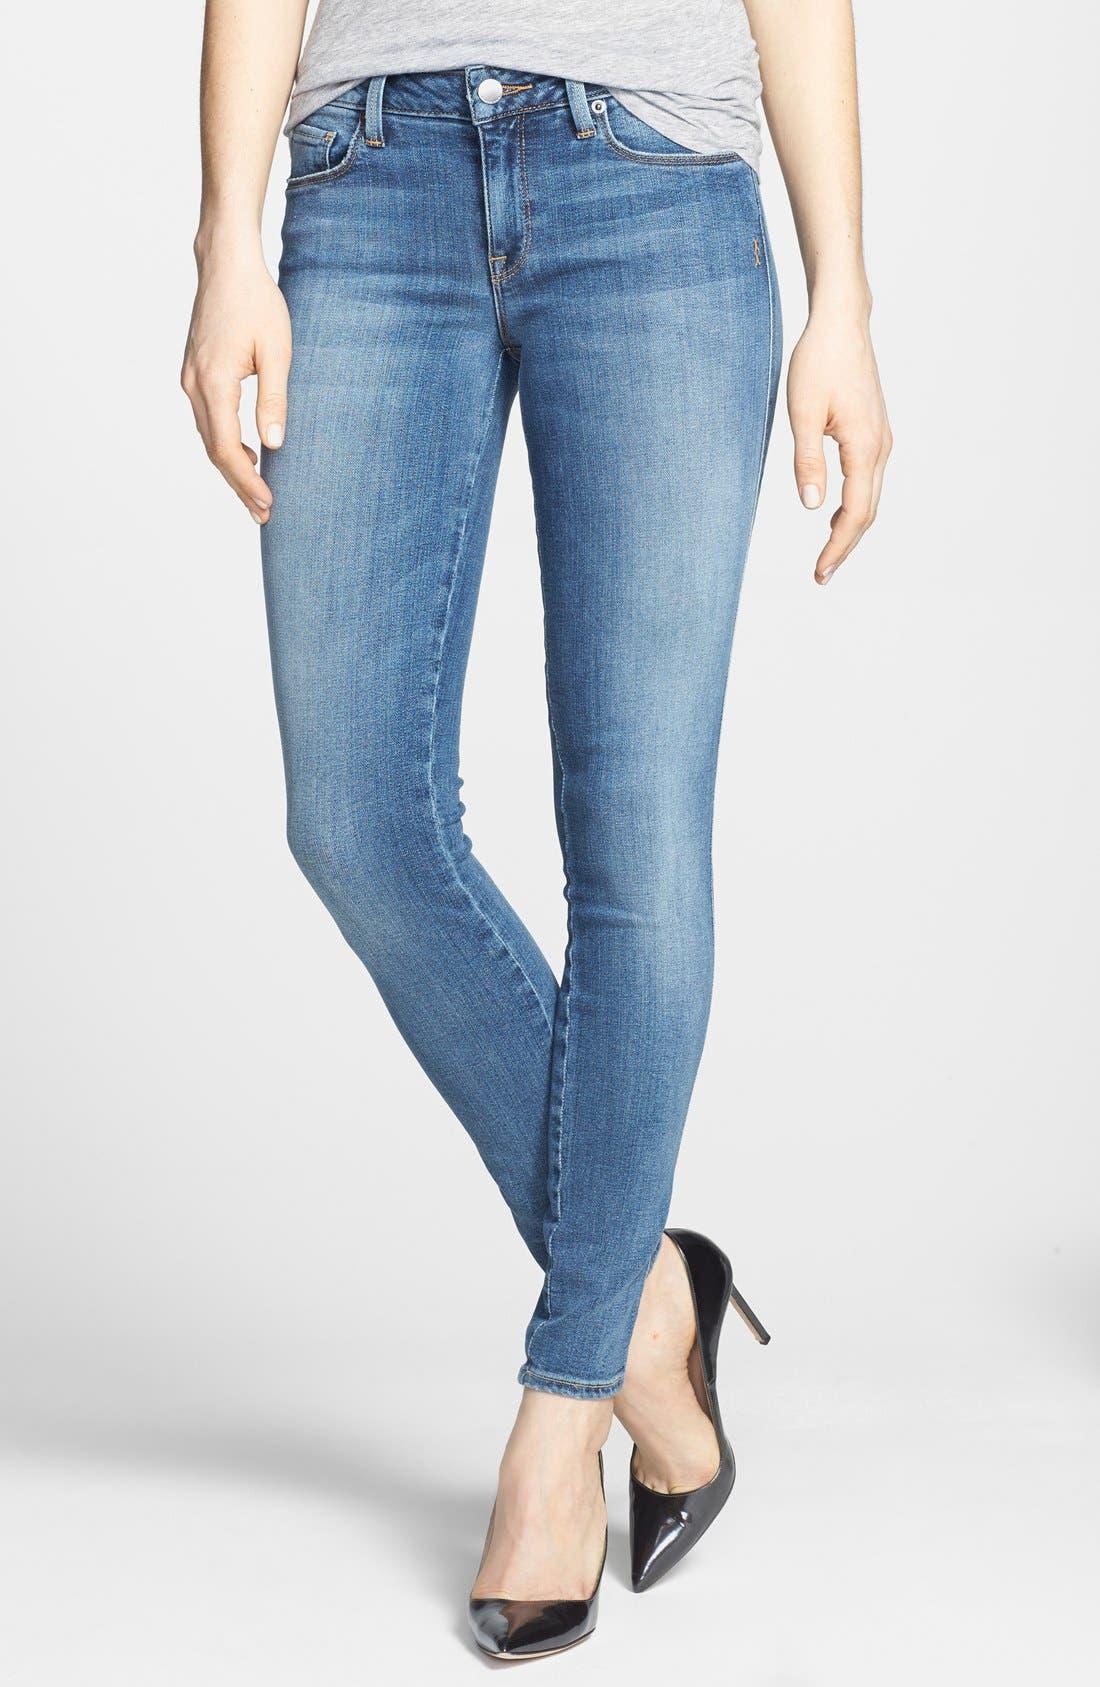 Alternate Image 1 Selected - Genetic 'Shya' Mid Rise Skinny Jeans (Polish)